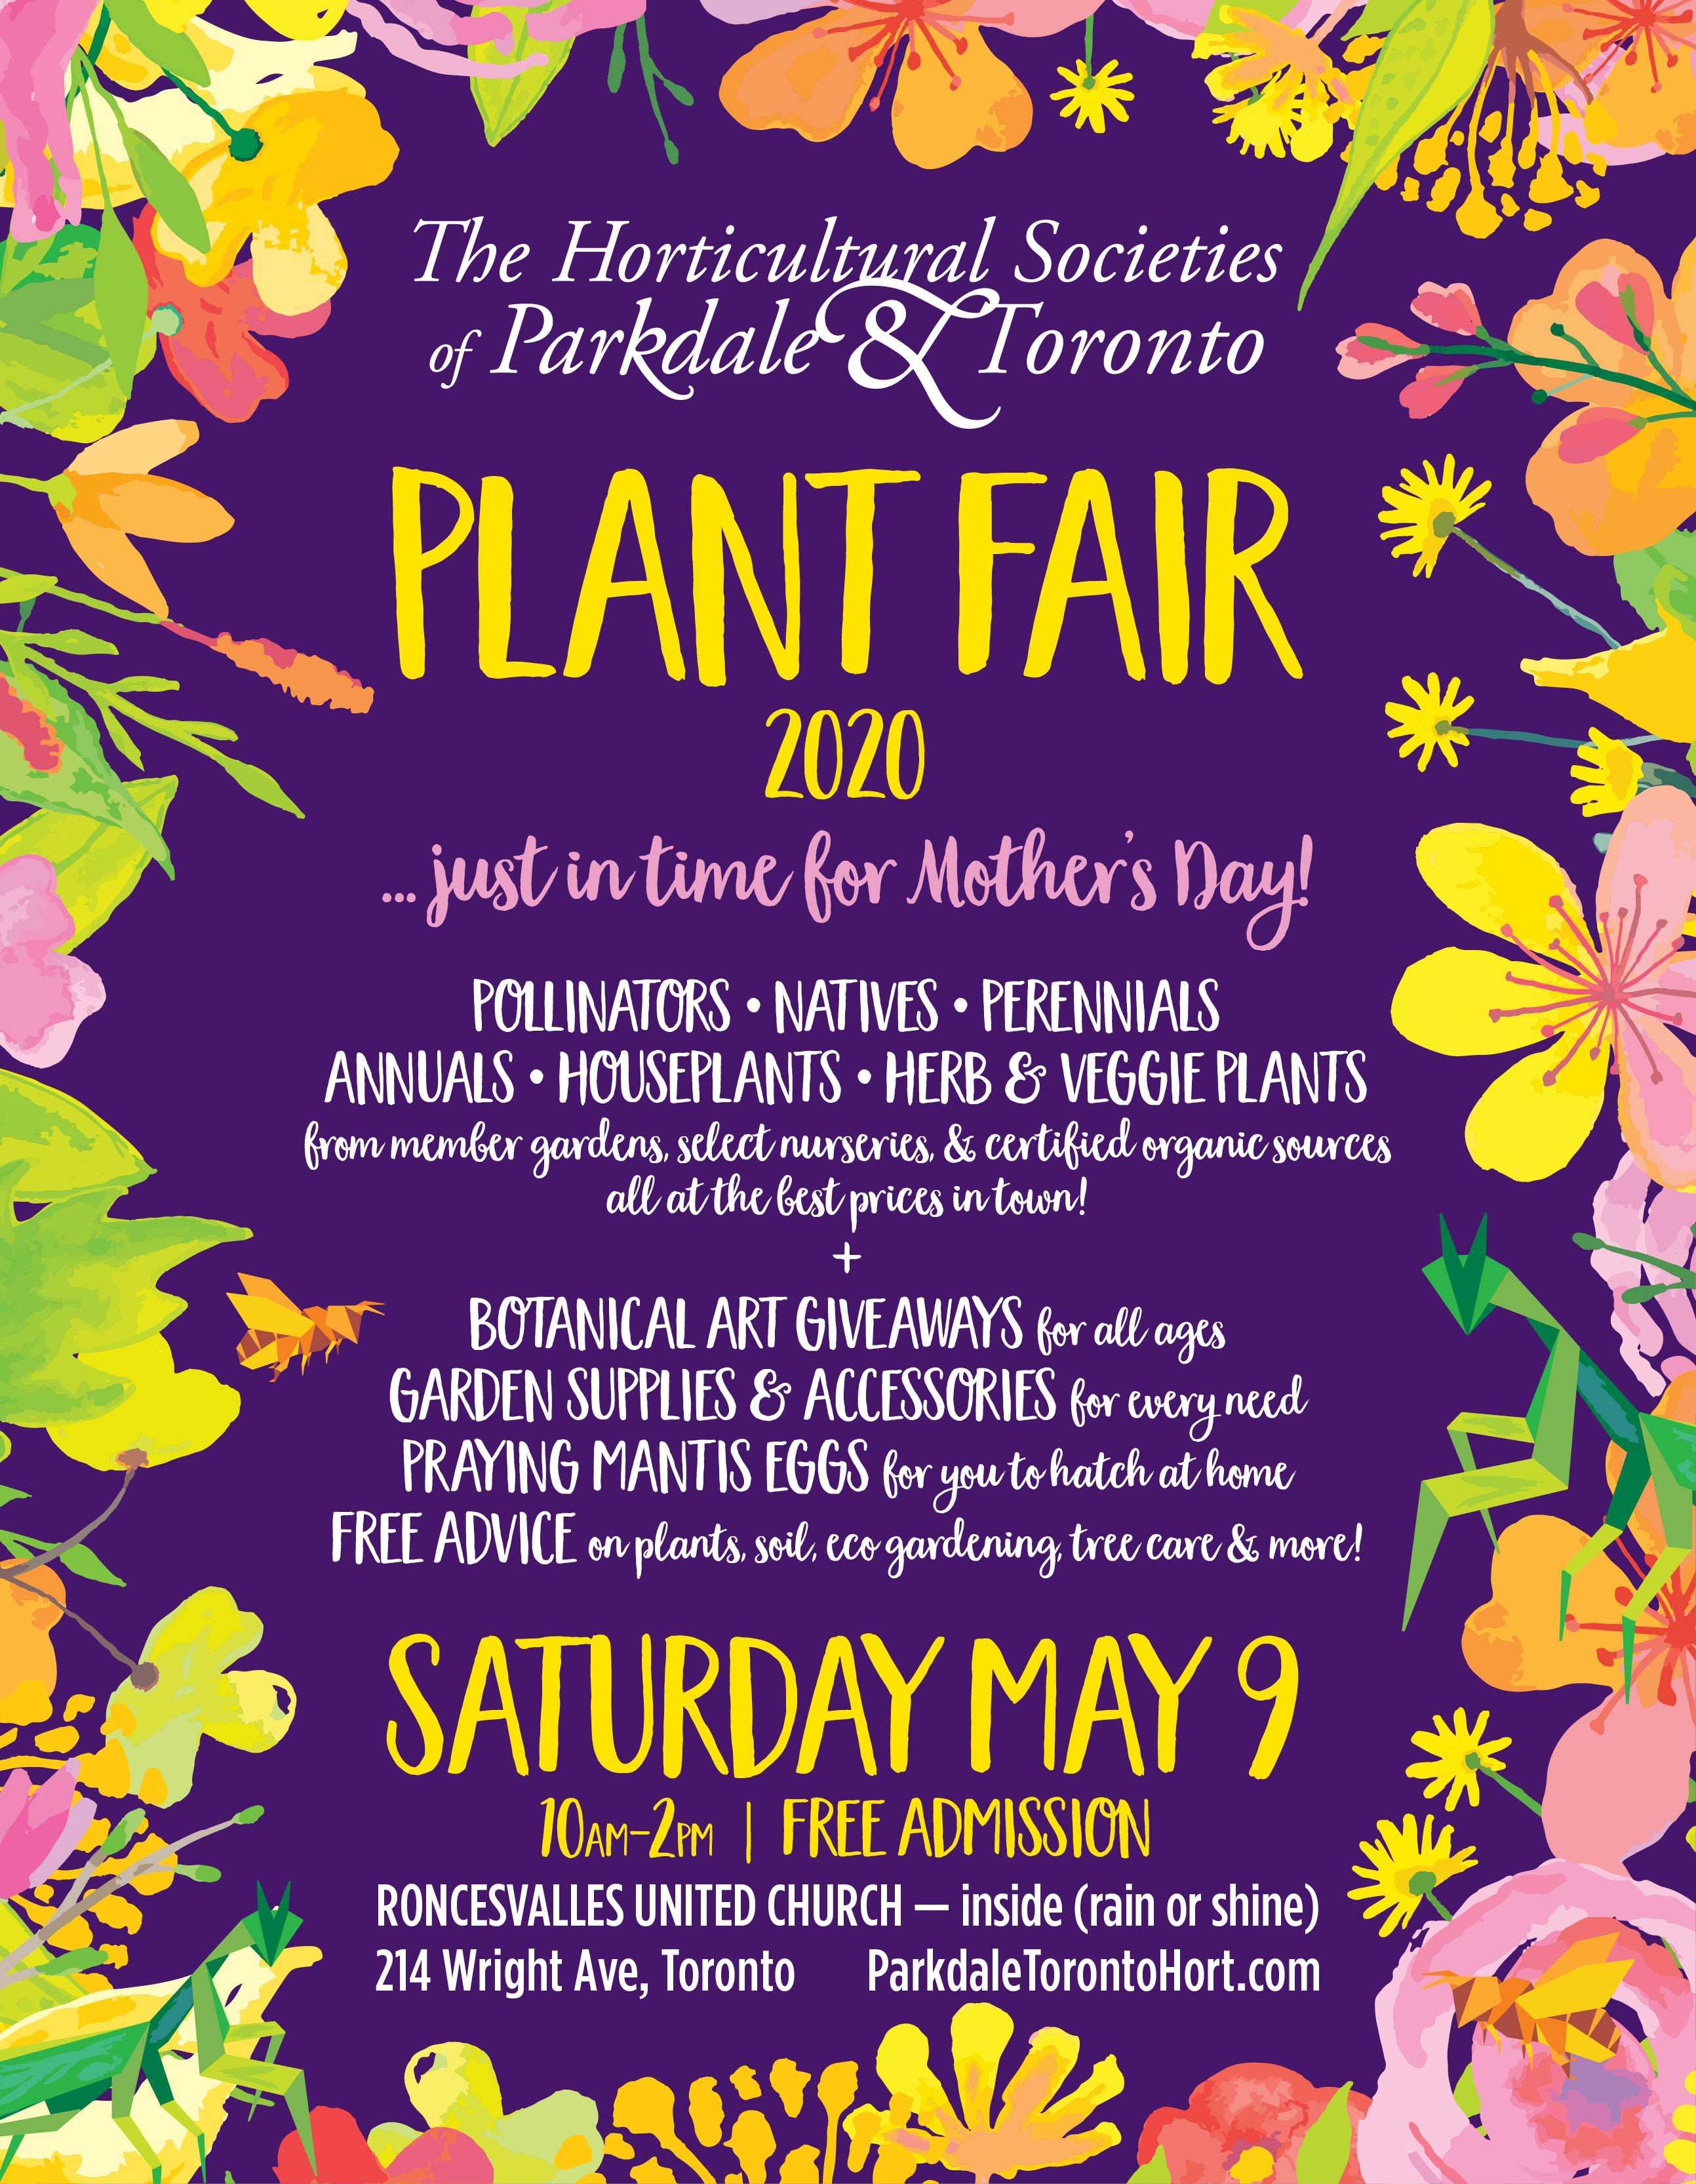 Plant Fair 2020: Parkdale & Toronto Horticultural Societies